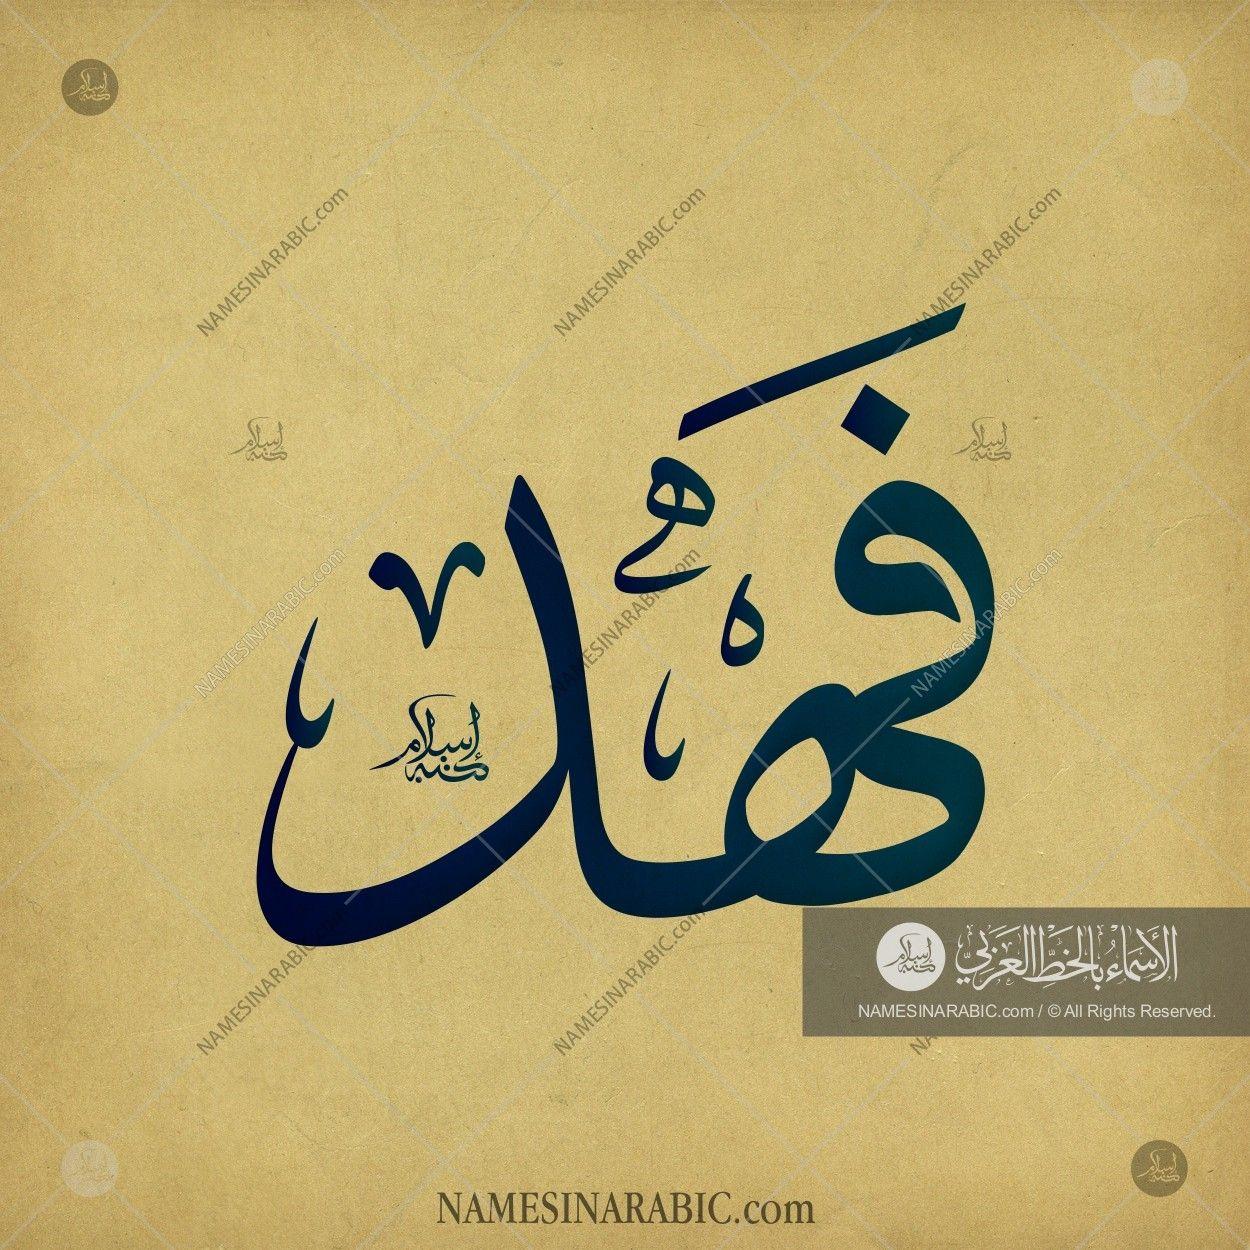 Fahd فهد Names In Arabic Calligraphy Name 3007 Calligraphy Name Calligraphy Islamic Art Calligraphy